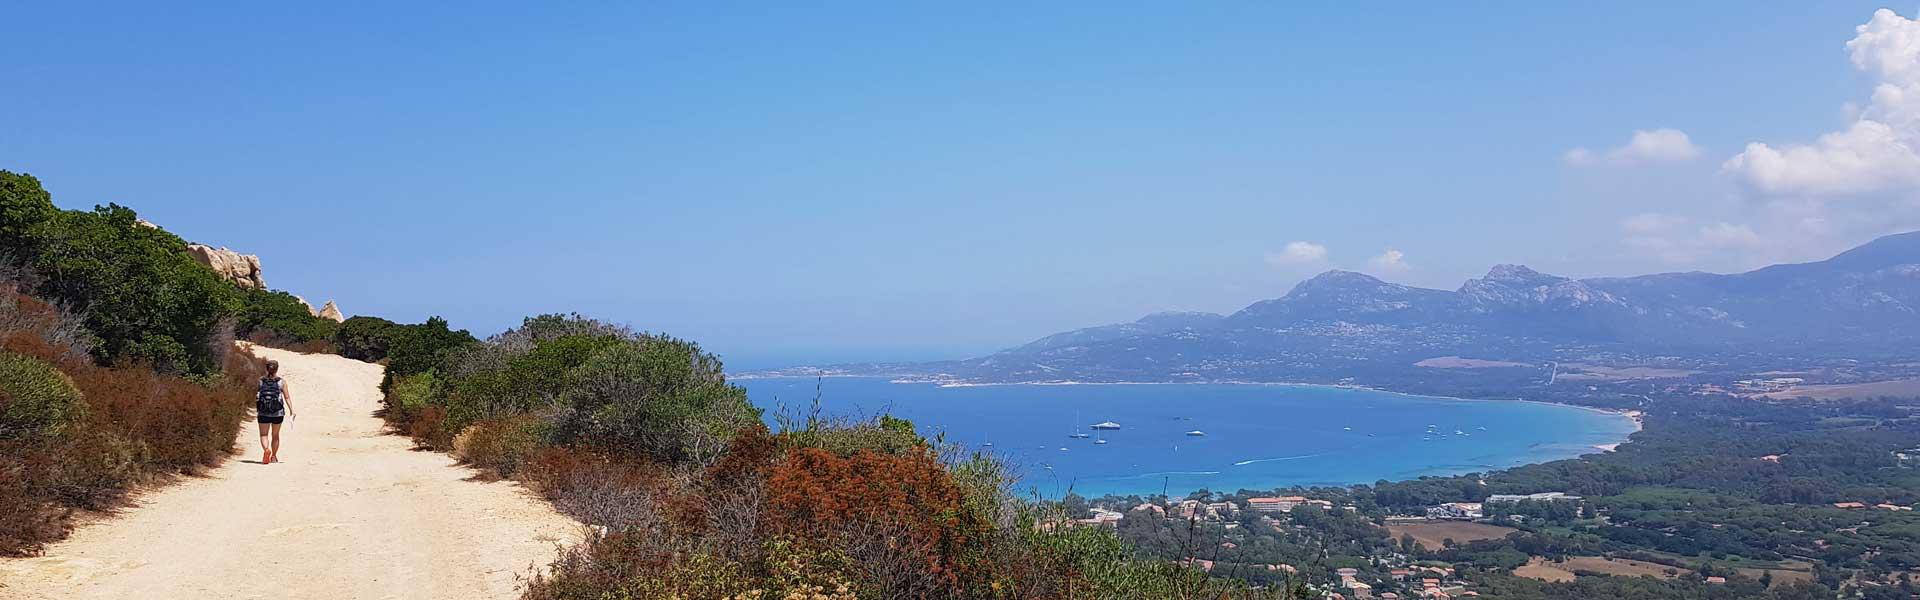 Korsika Vandreferie